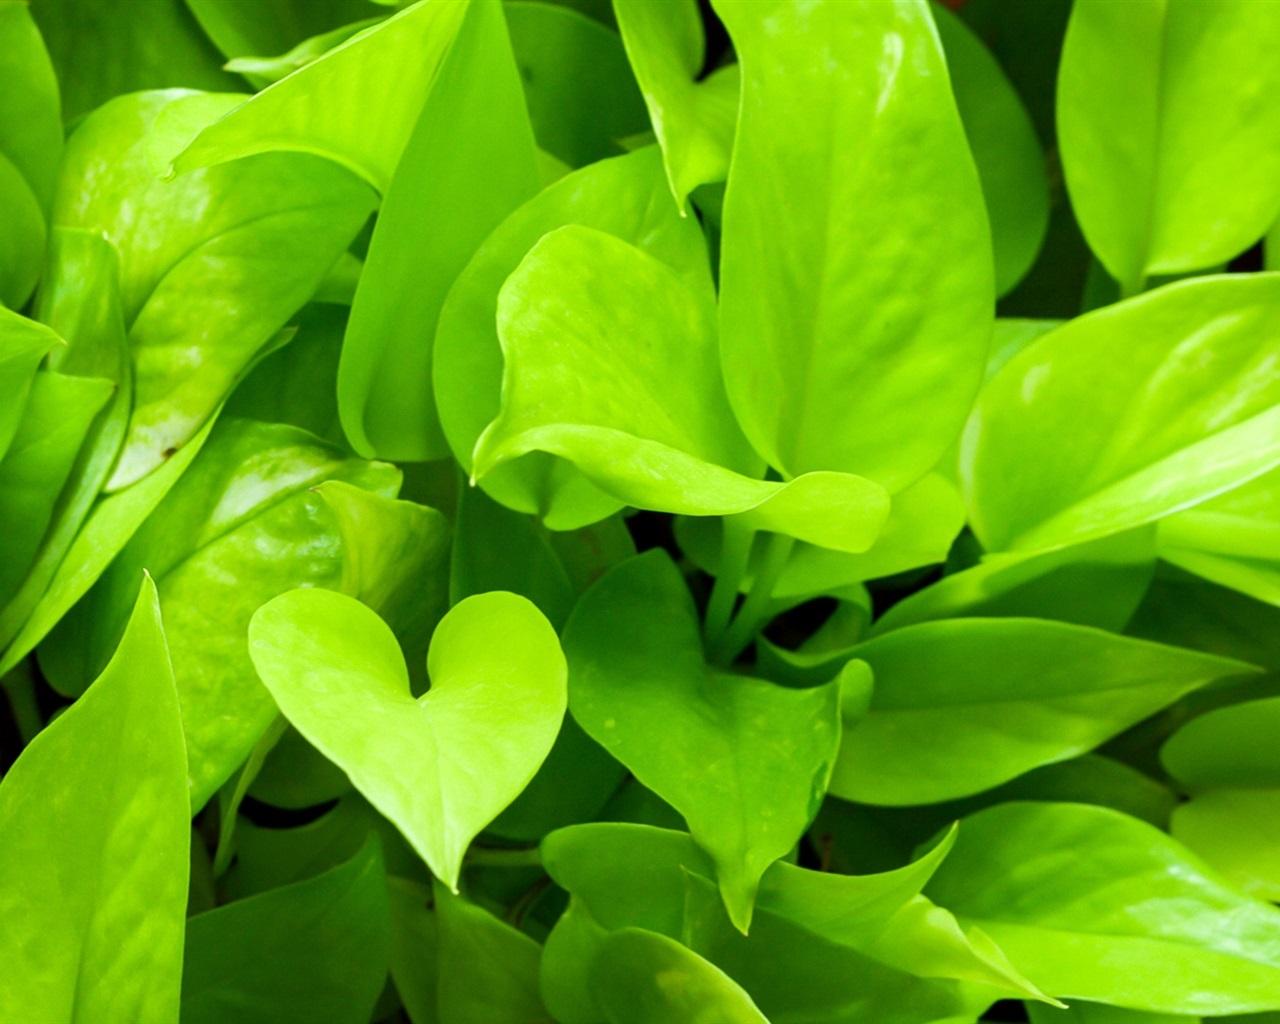 fonds d 39 cran les plantes vertes close up pothos 1920x1200 hd image. Black Bedroom Furniture Sets. Home Design Ideas